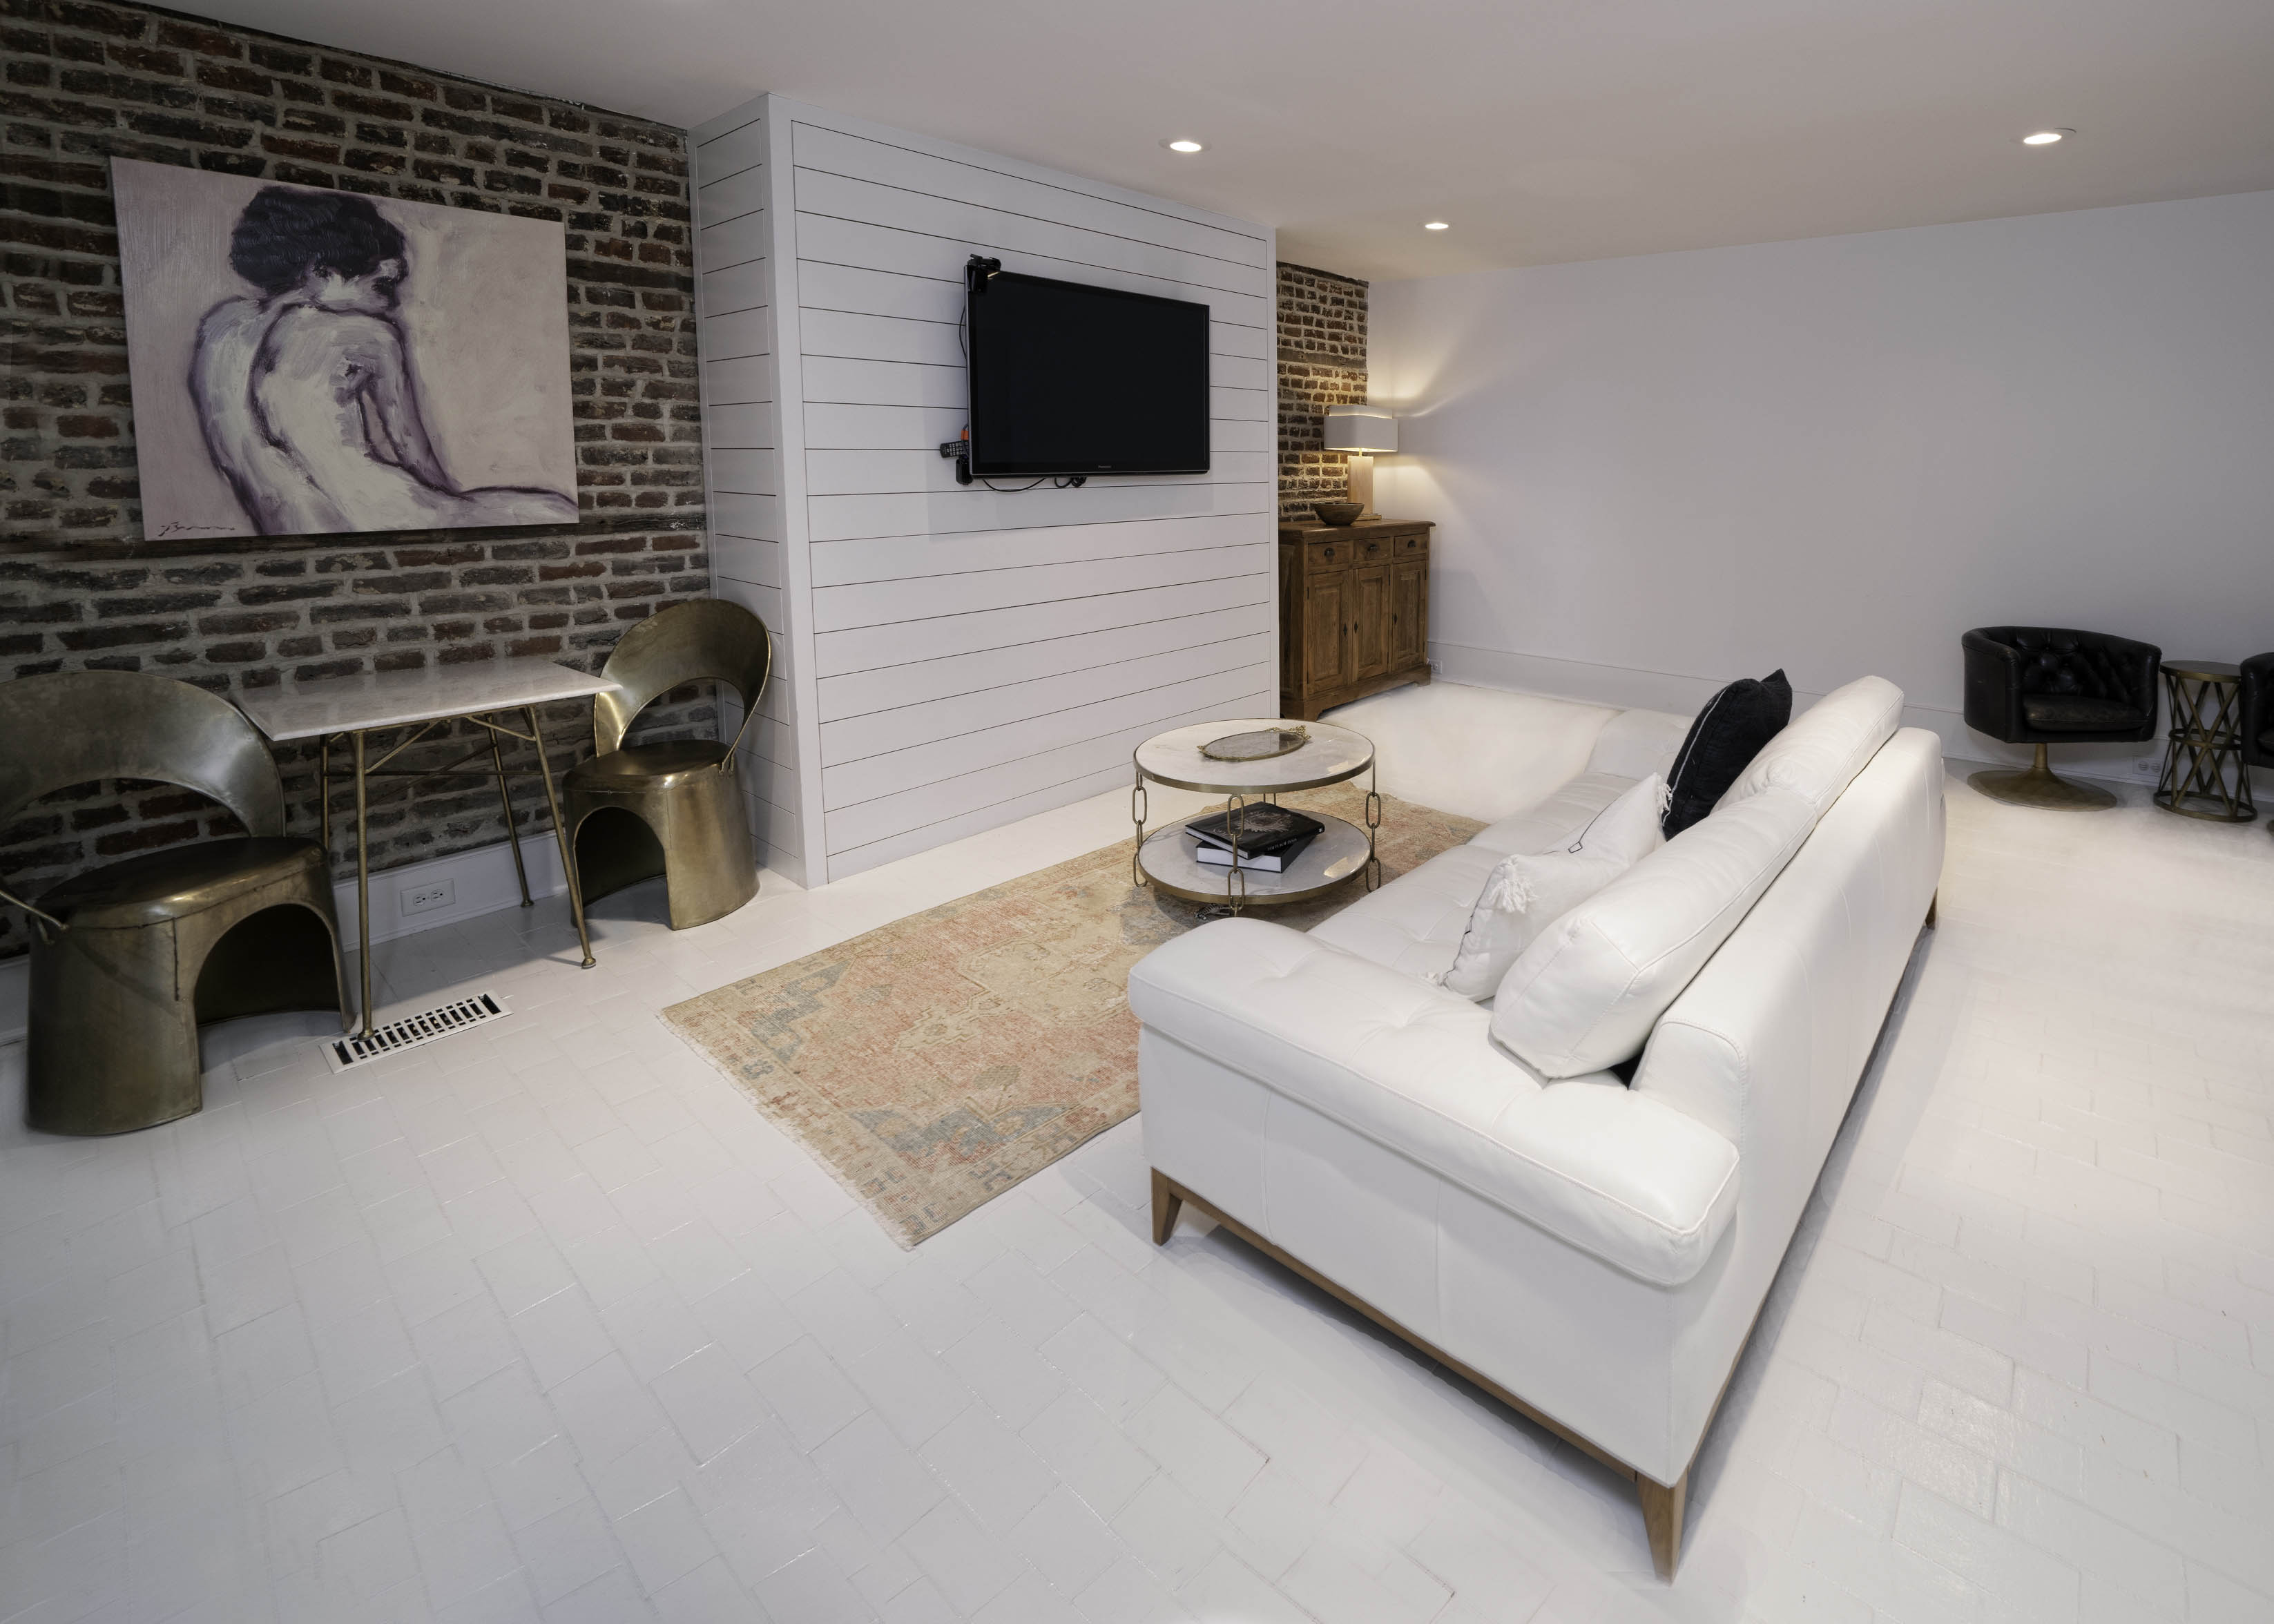 34 Montagu Street B living room